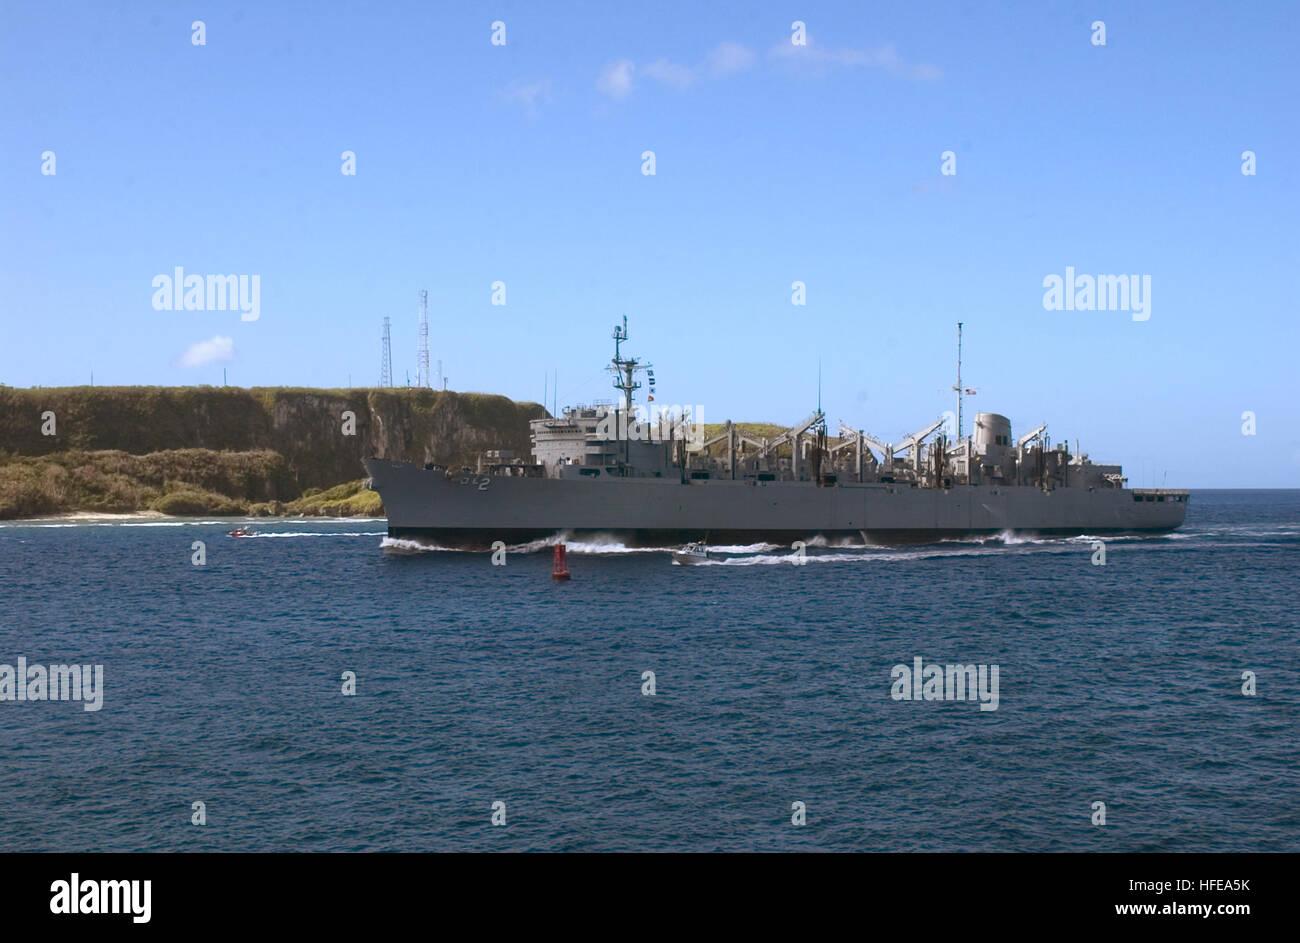 050221-N-4658L-197 Santa Rita, Guam (Feb. 21, 2005) - The fast combat support ship USS Camden (AOE 2) enters Apra - Stock Image